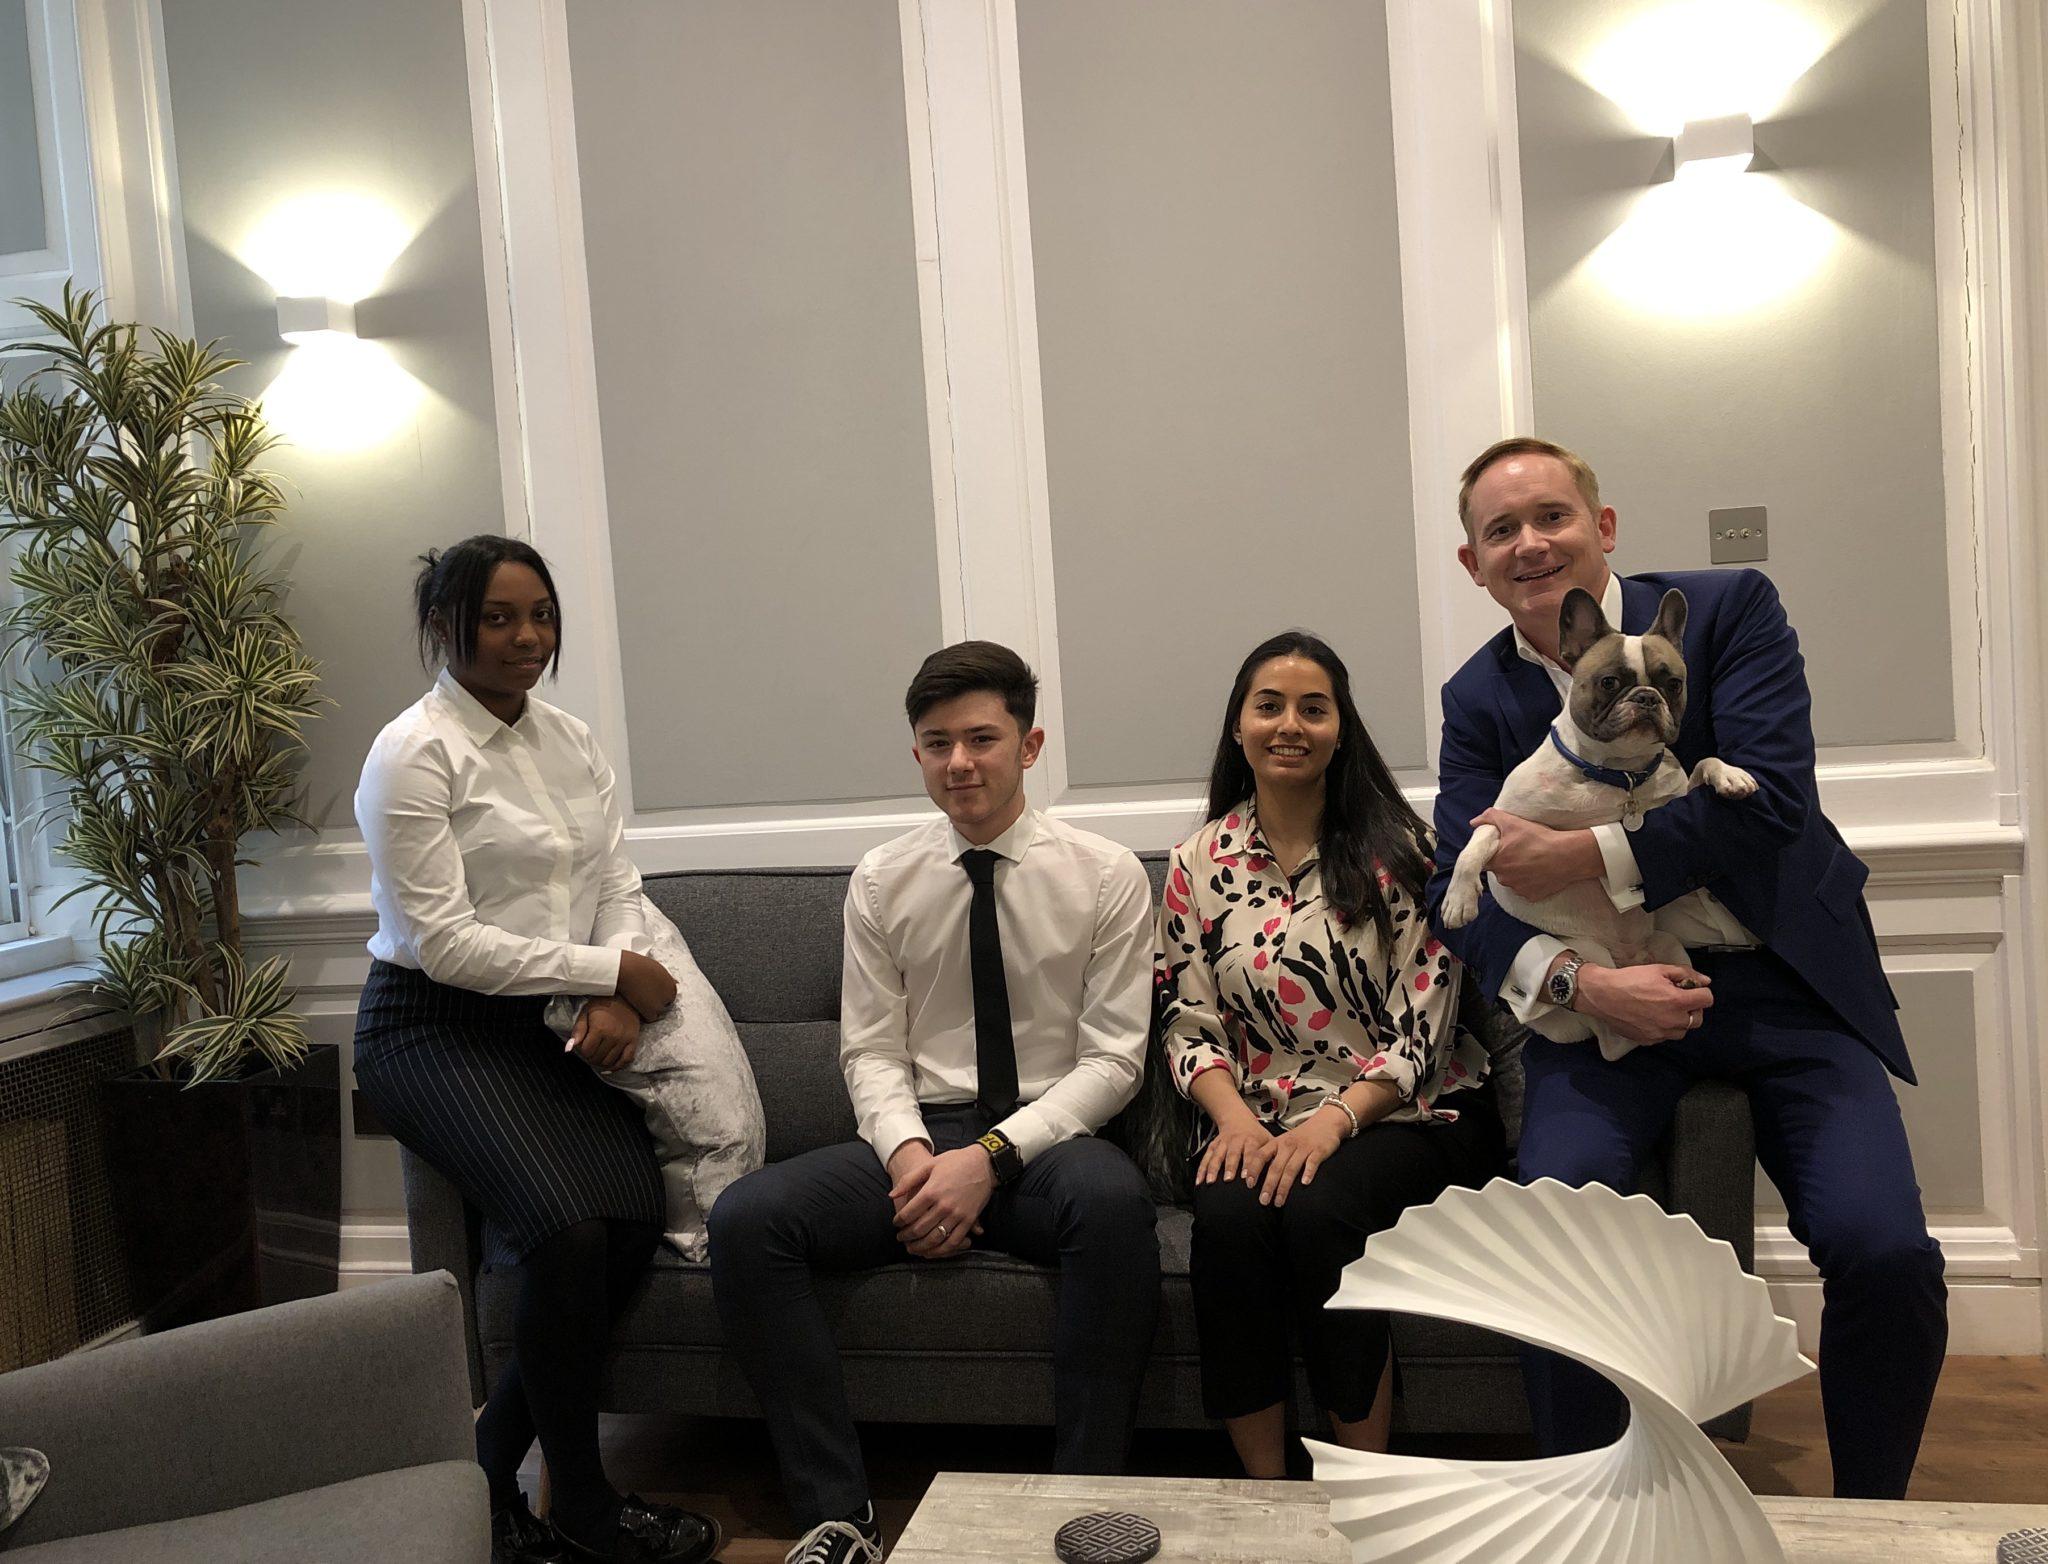 L-R Nicole Antoine, Basil Herr, Esraa Akar, Bryan McMorrine and companion dog Isaac McMorrine